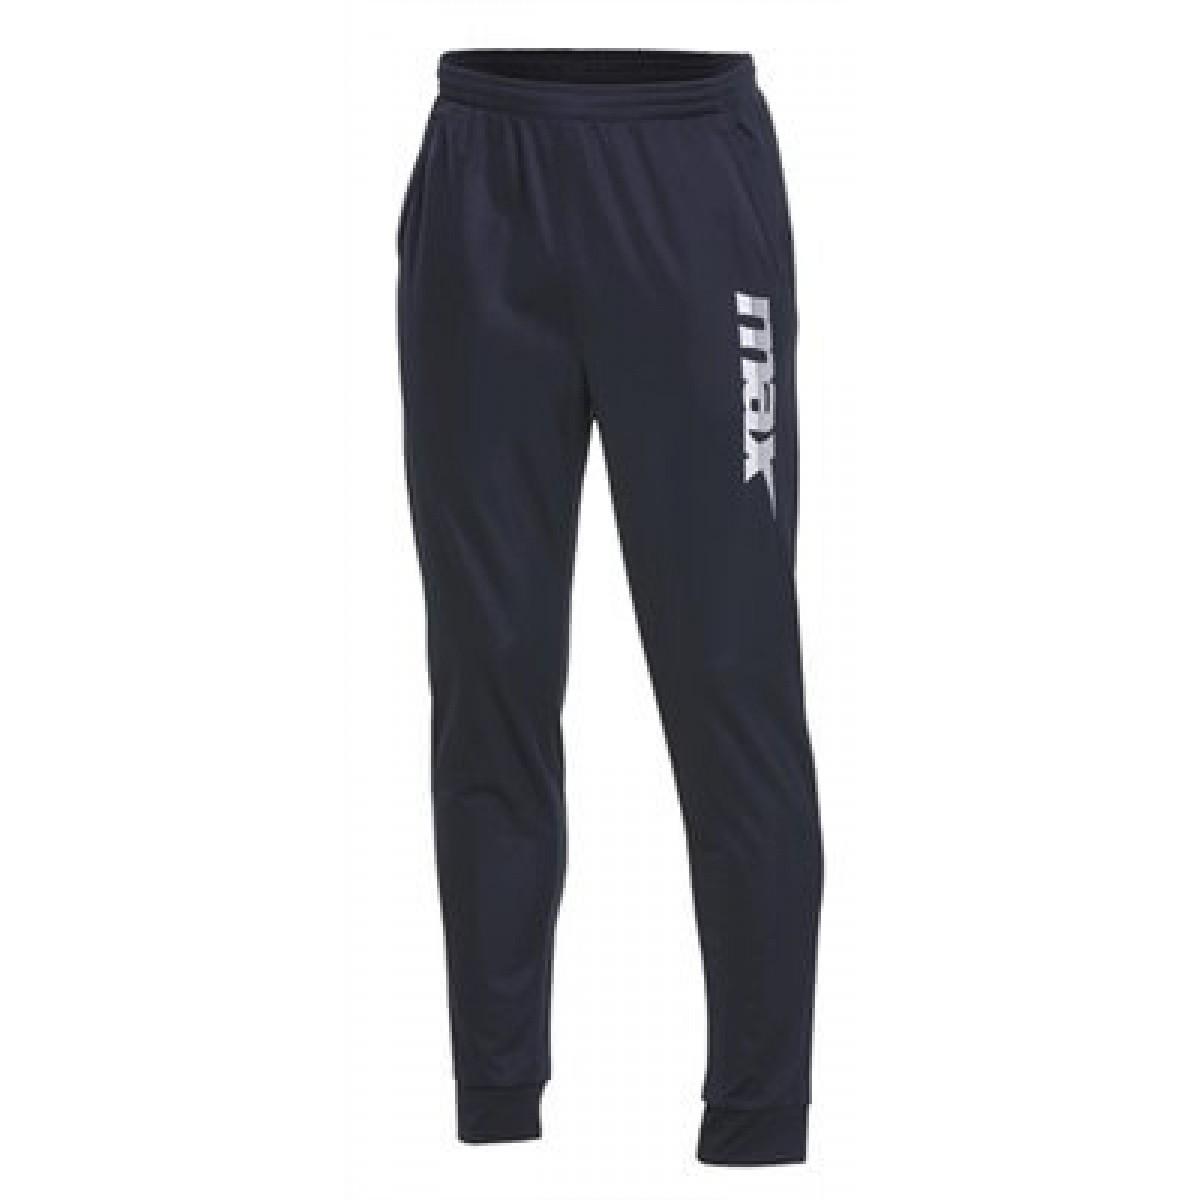 Max Astoria joggingbukser sort